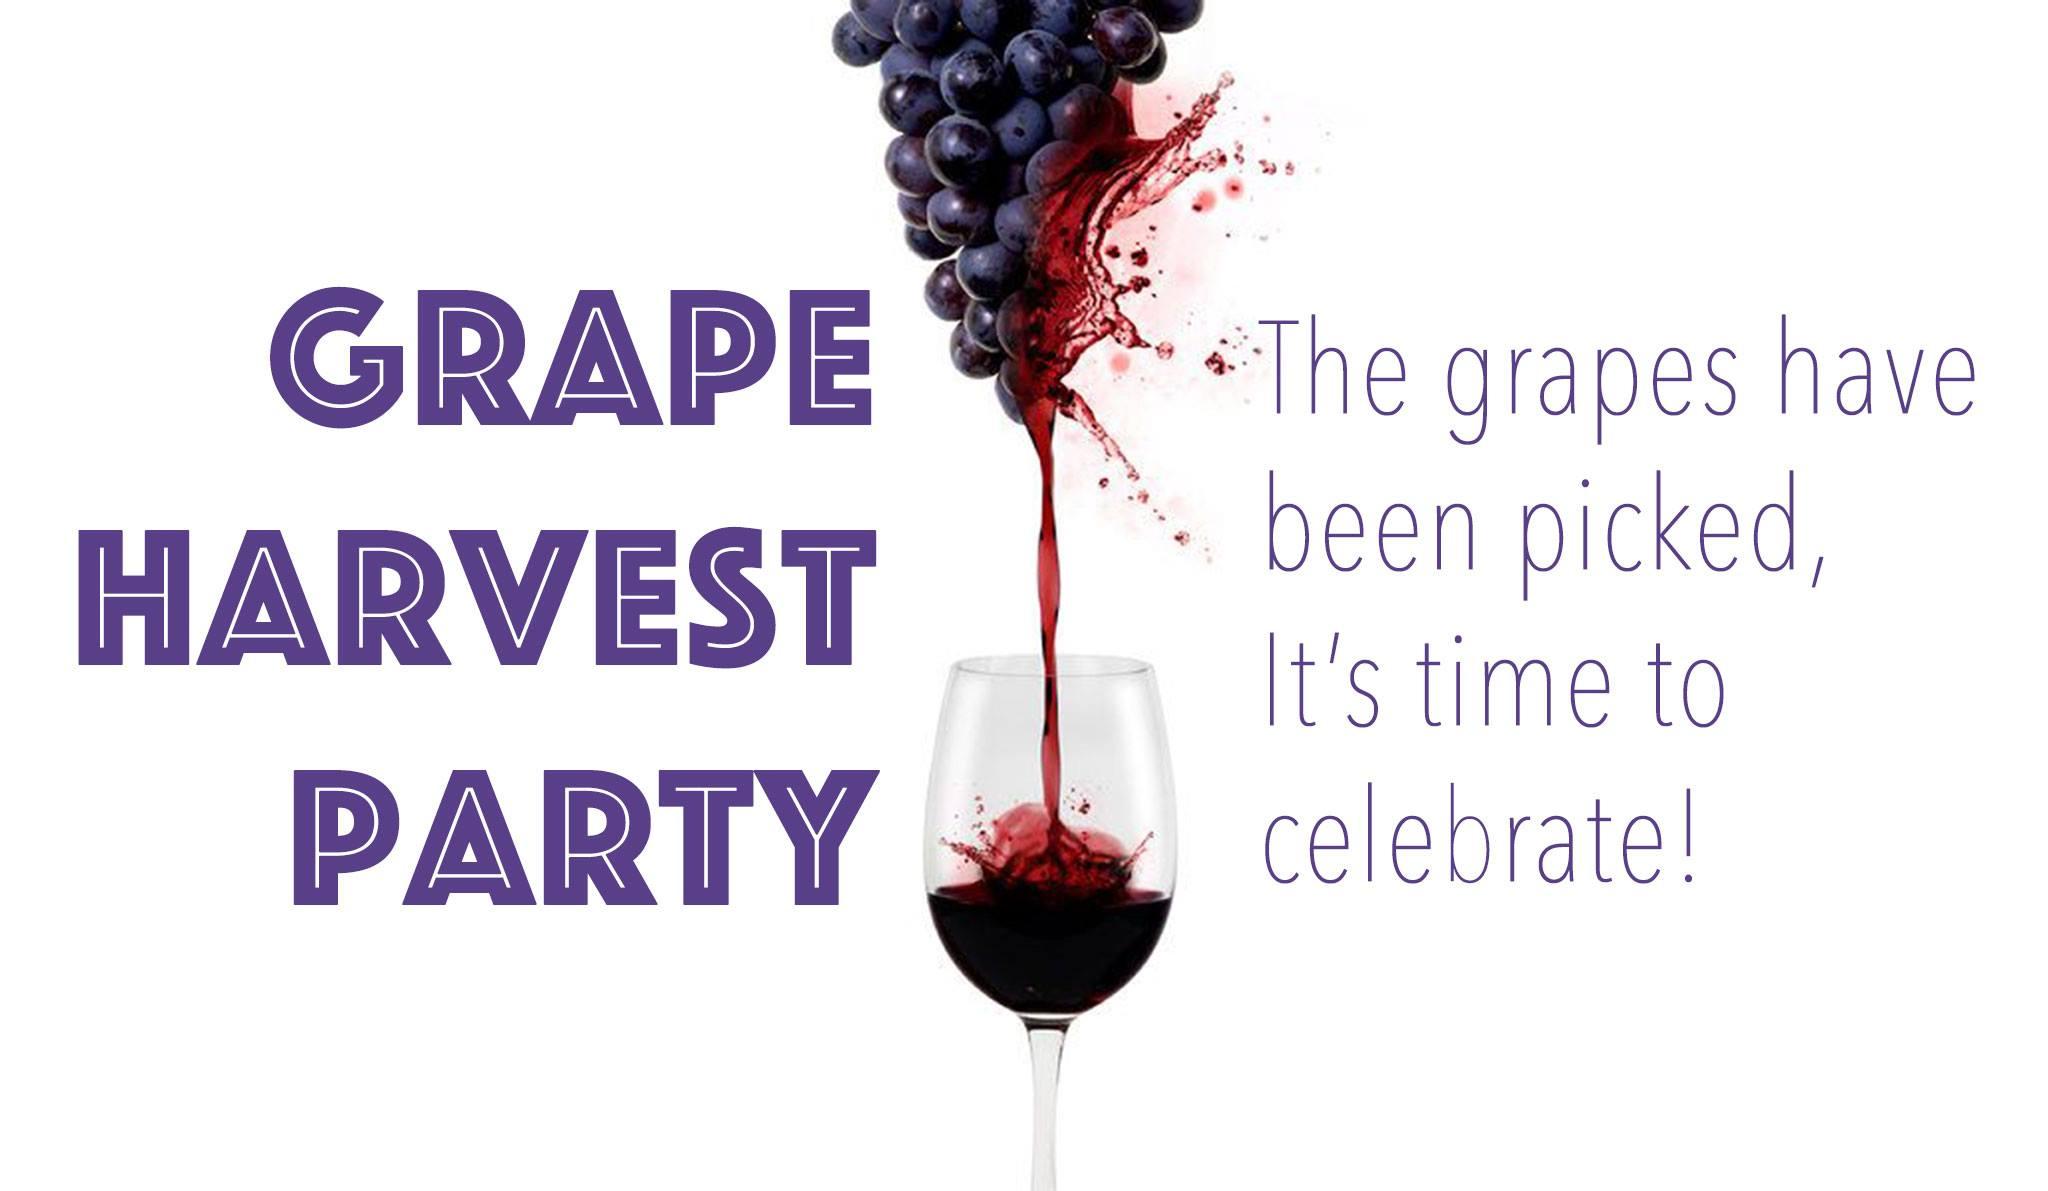 grape harvest party 2019.jpg